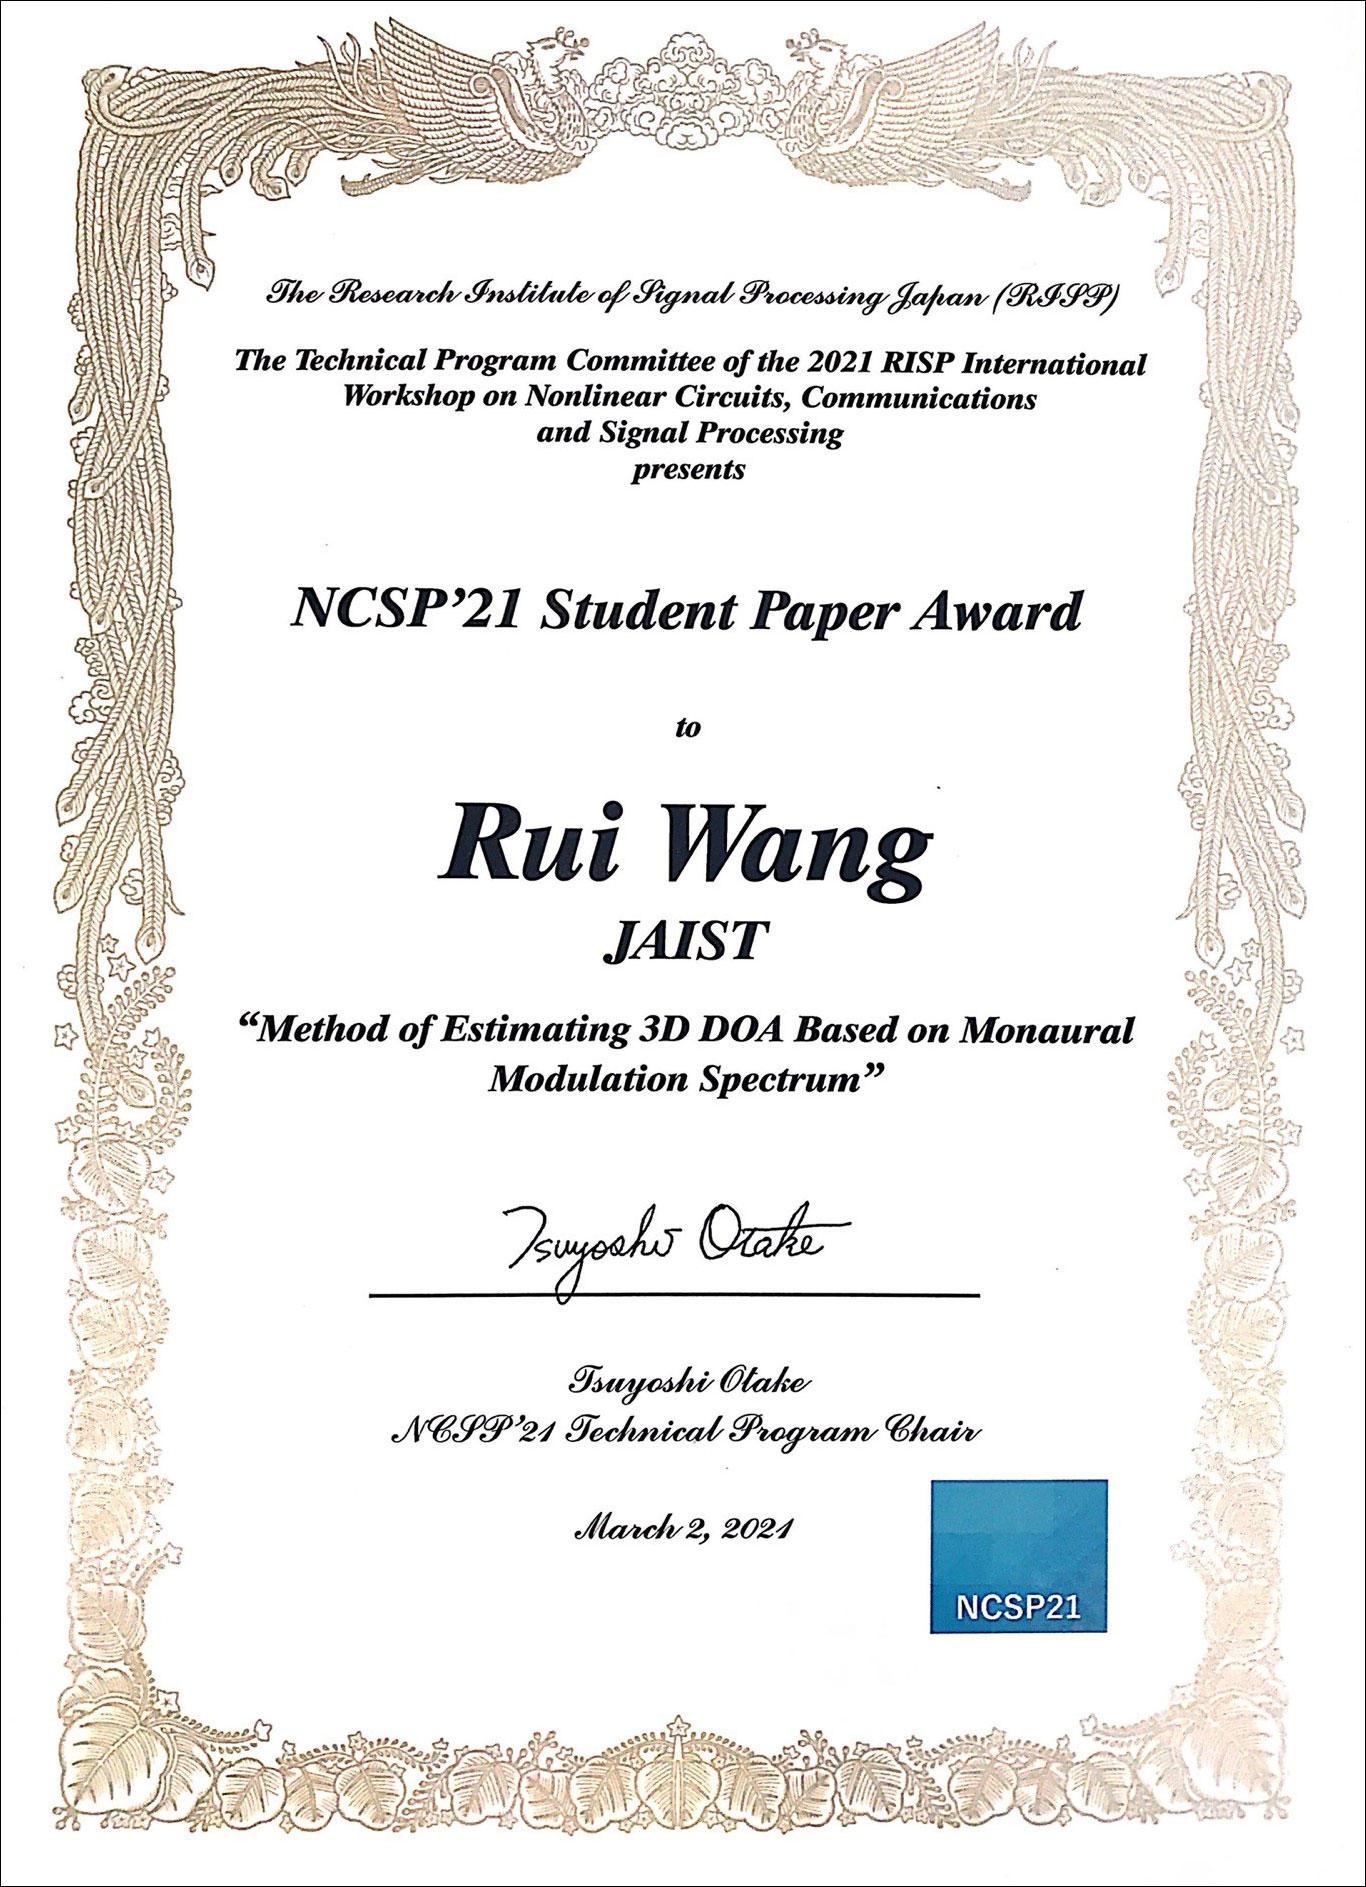 award20210318-1.jpg